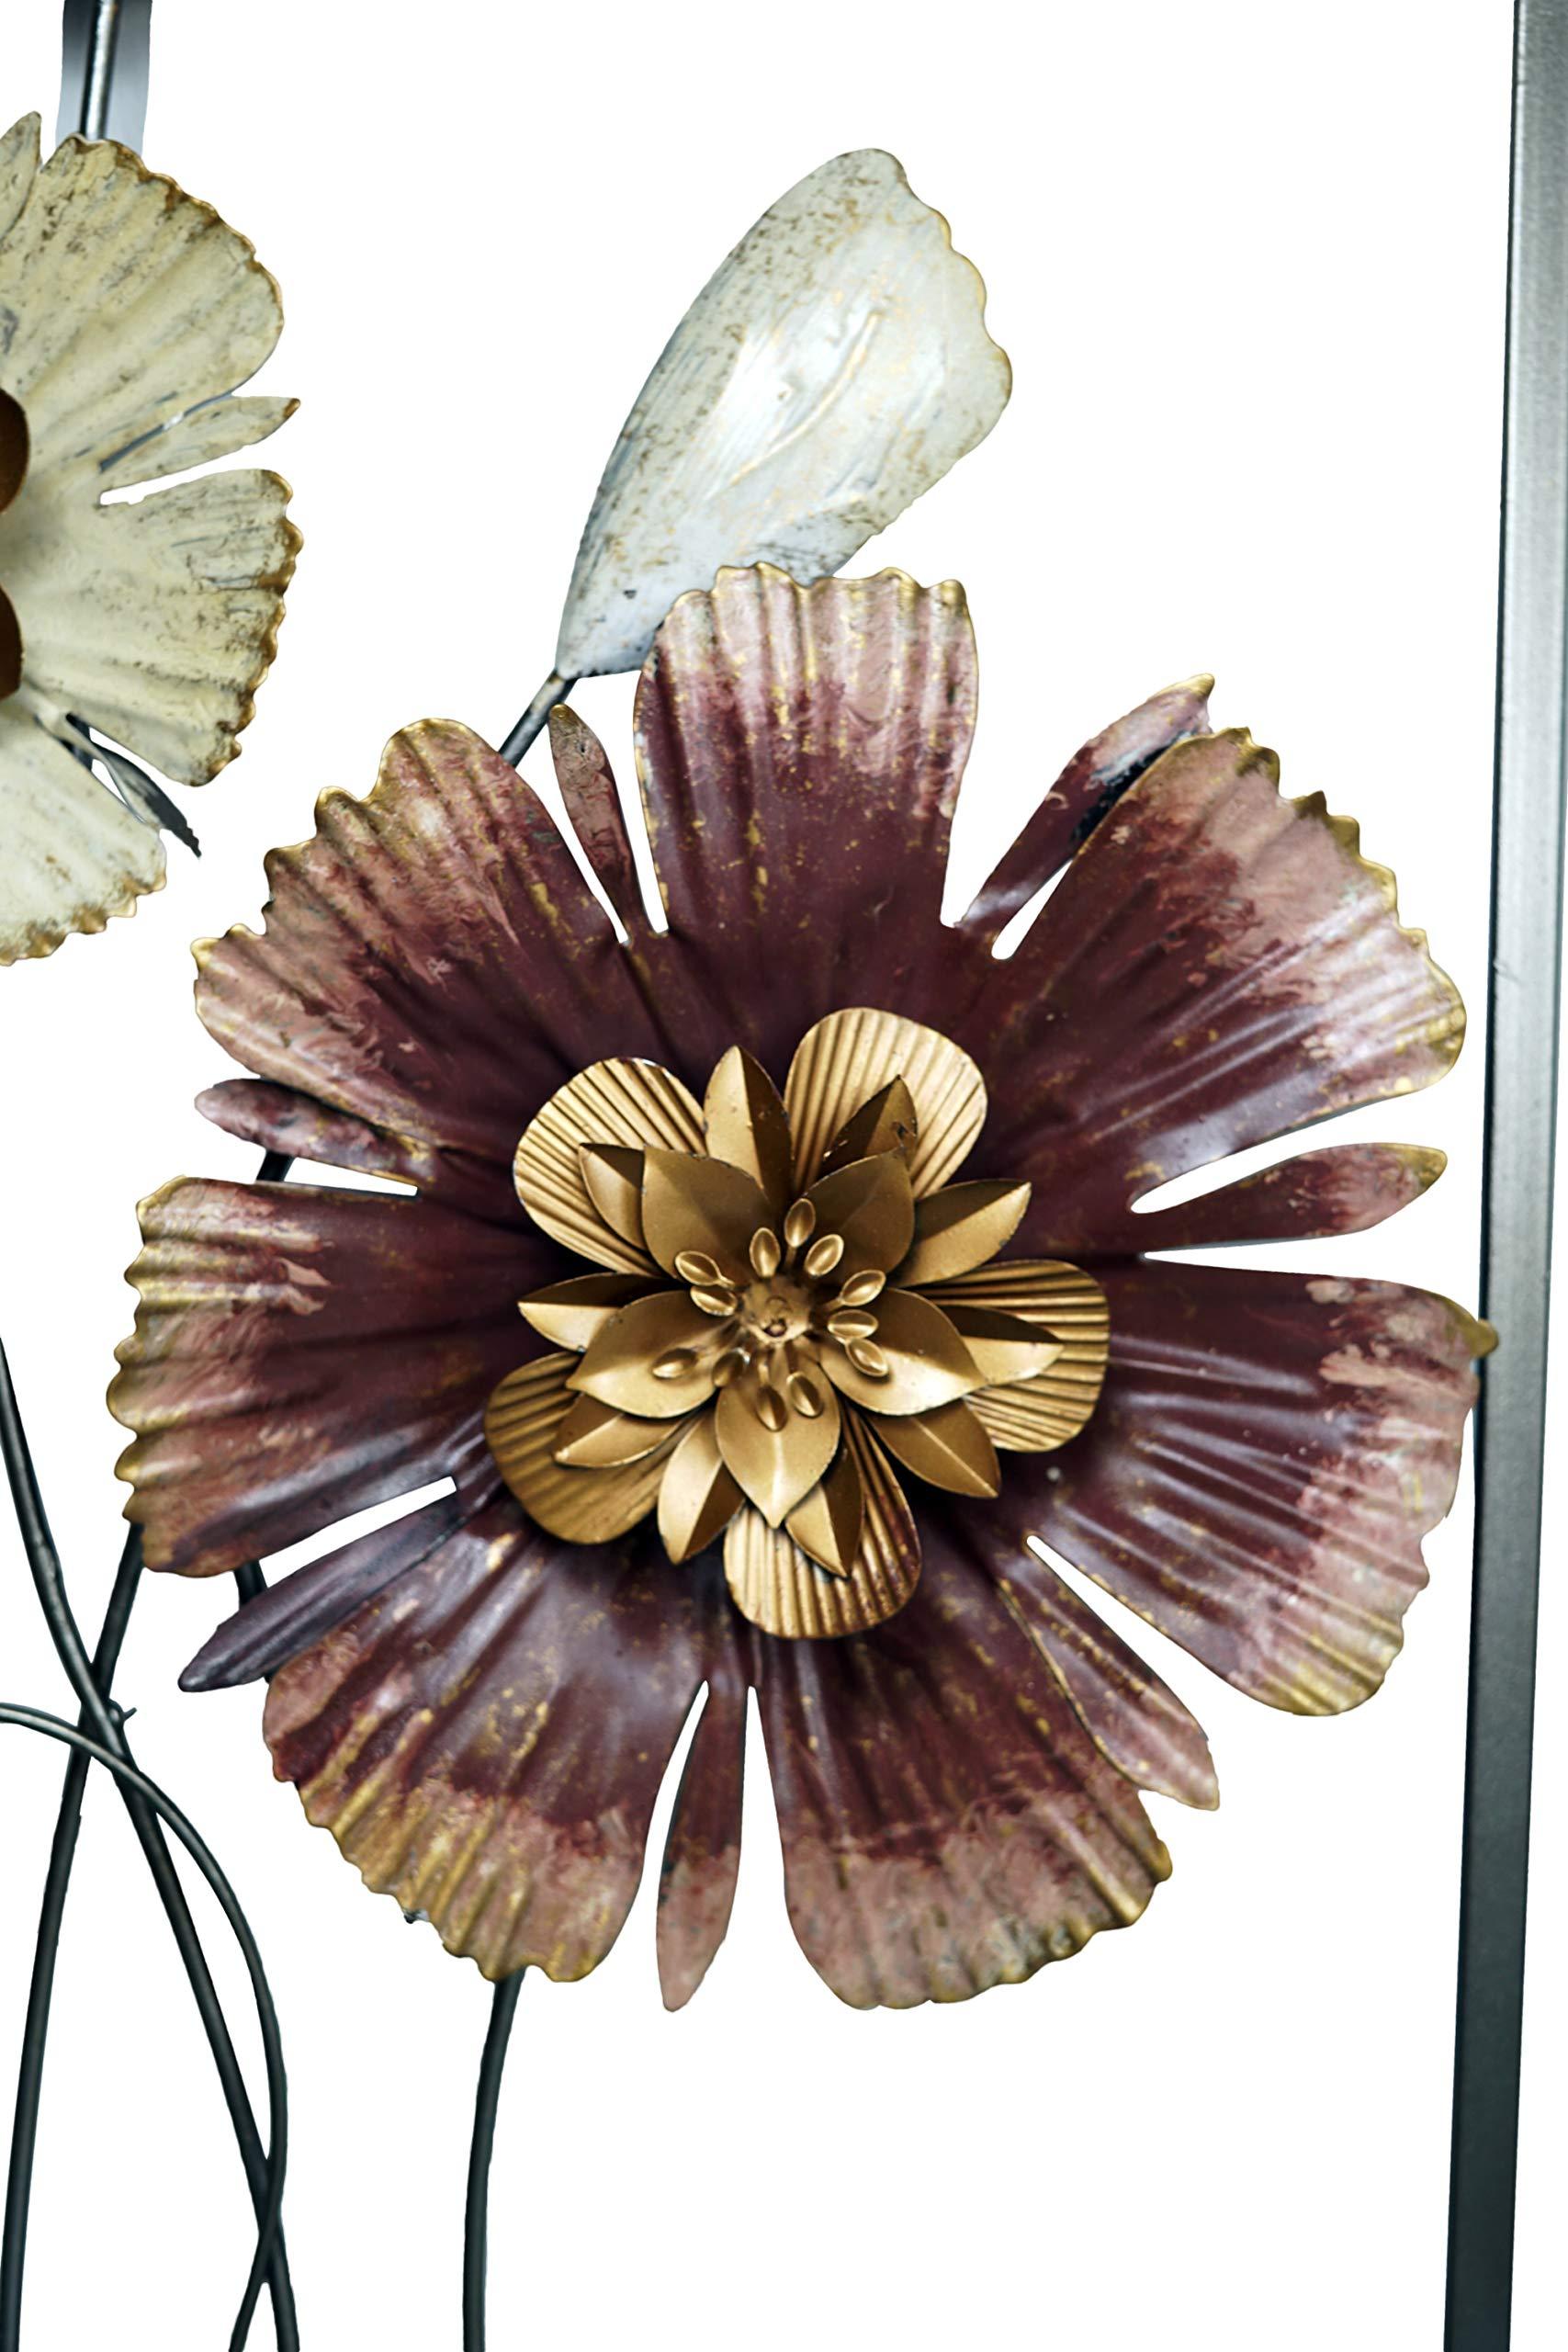 38 x 50 cm Cuadro de Metal dise/ño de Flor khevga